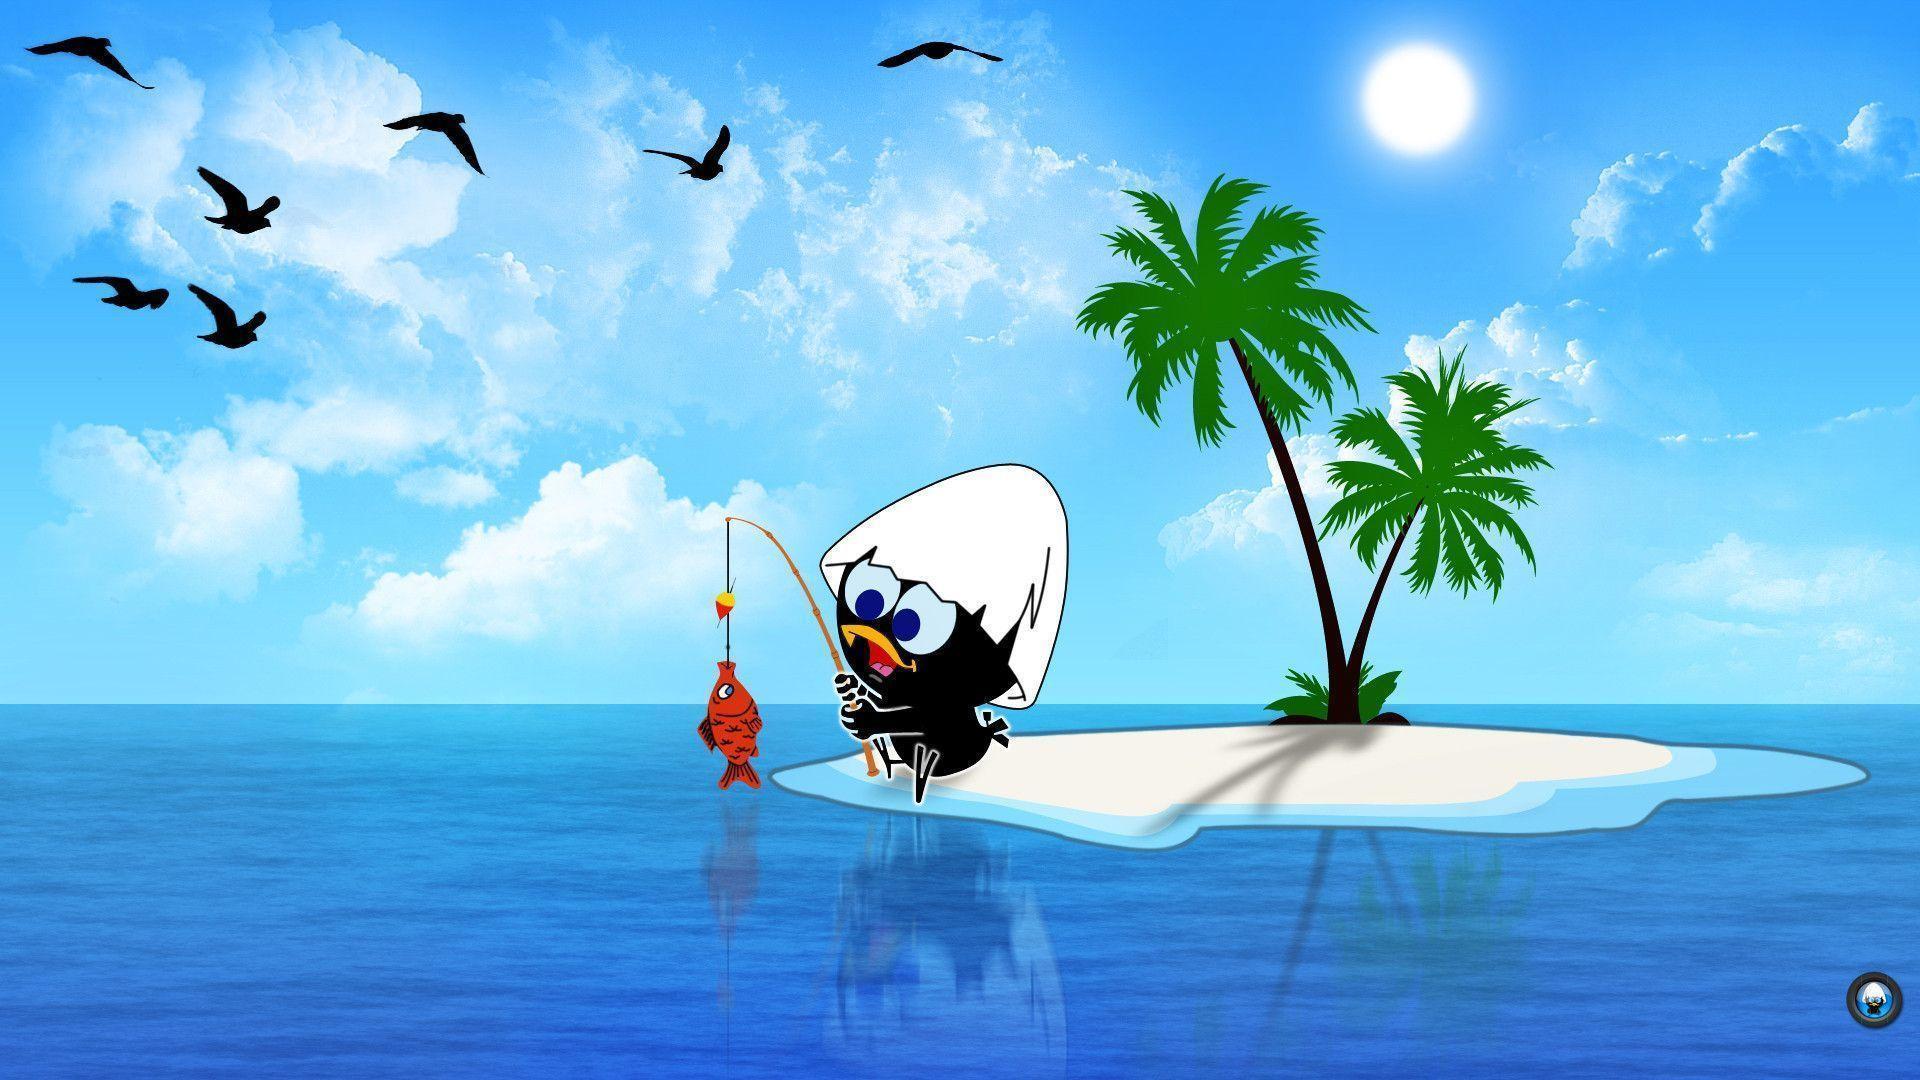 Free Cartoon Wallpaper Backgrounds